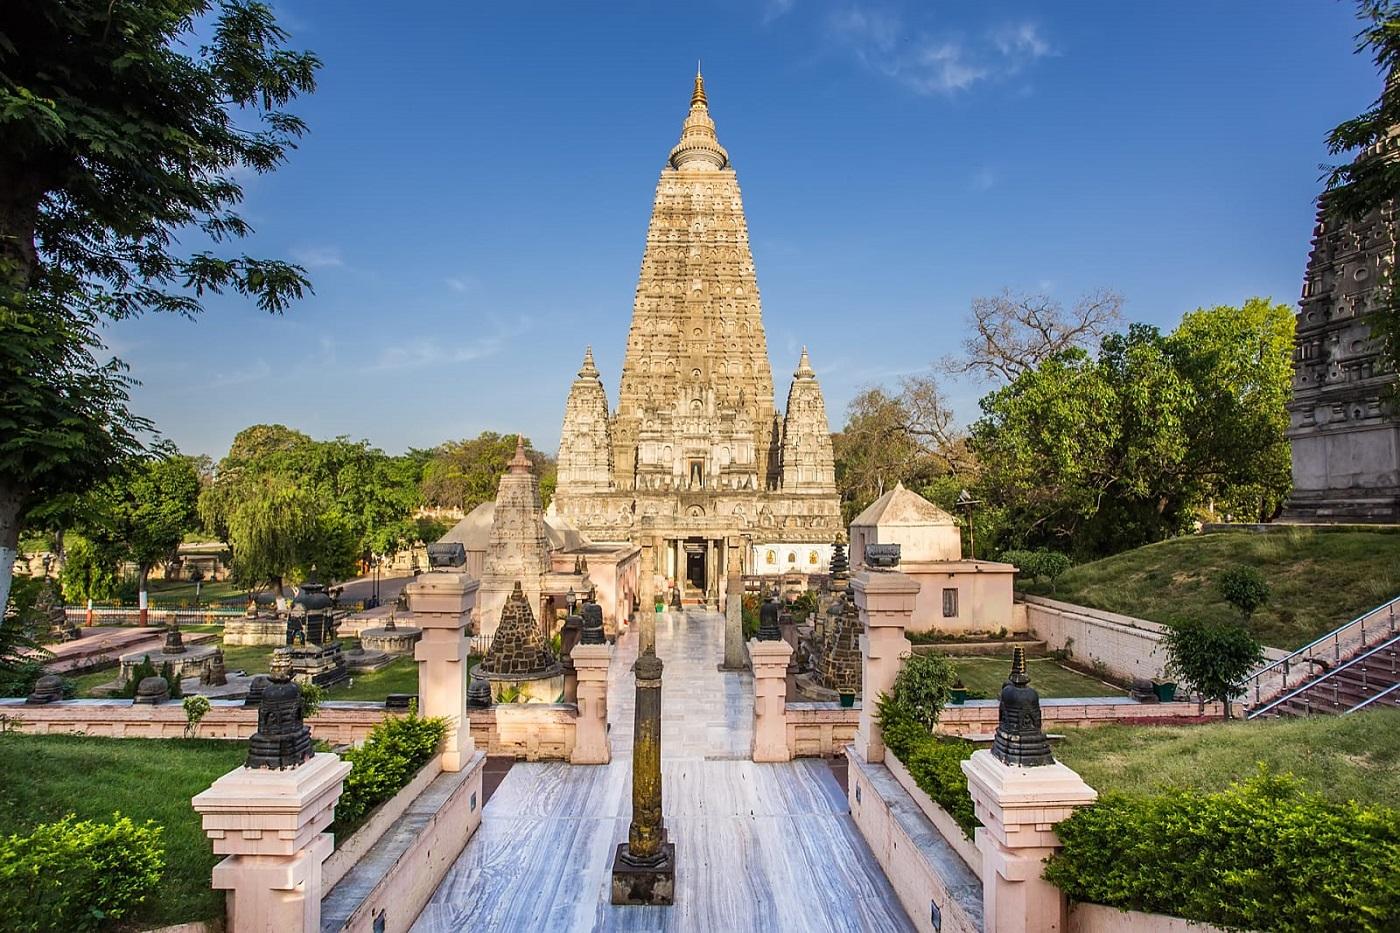 Mahabodhi Temple Complex, Bodhgaya